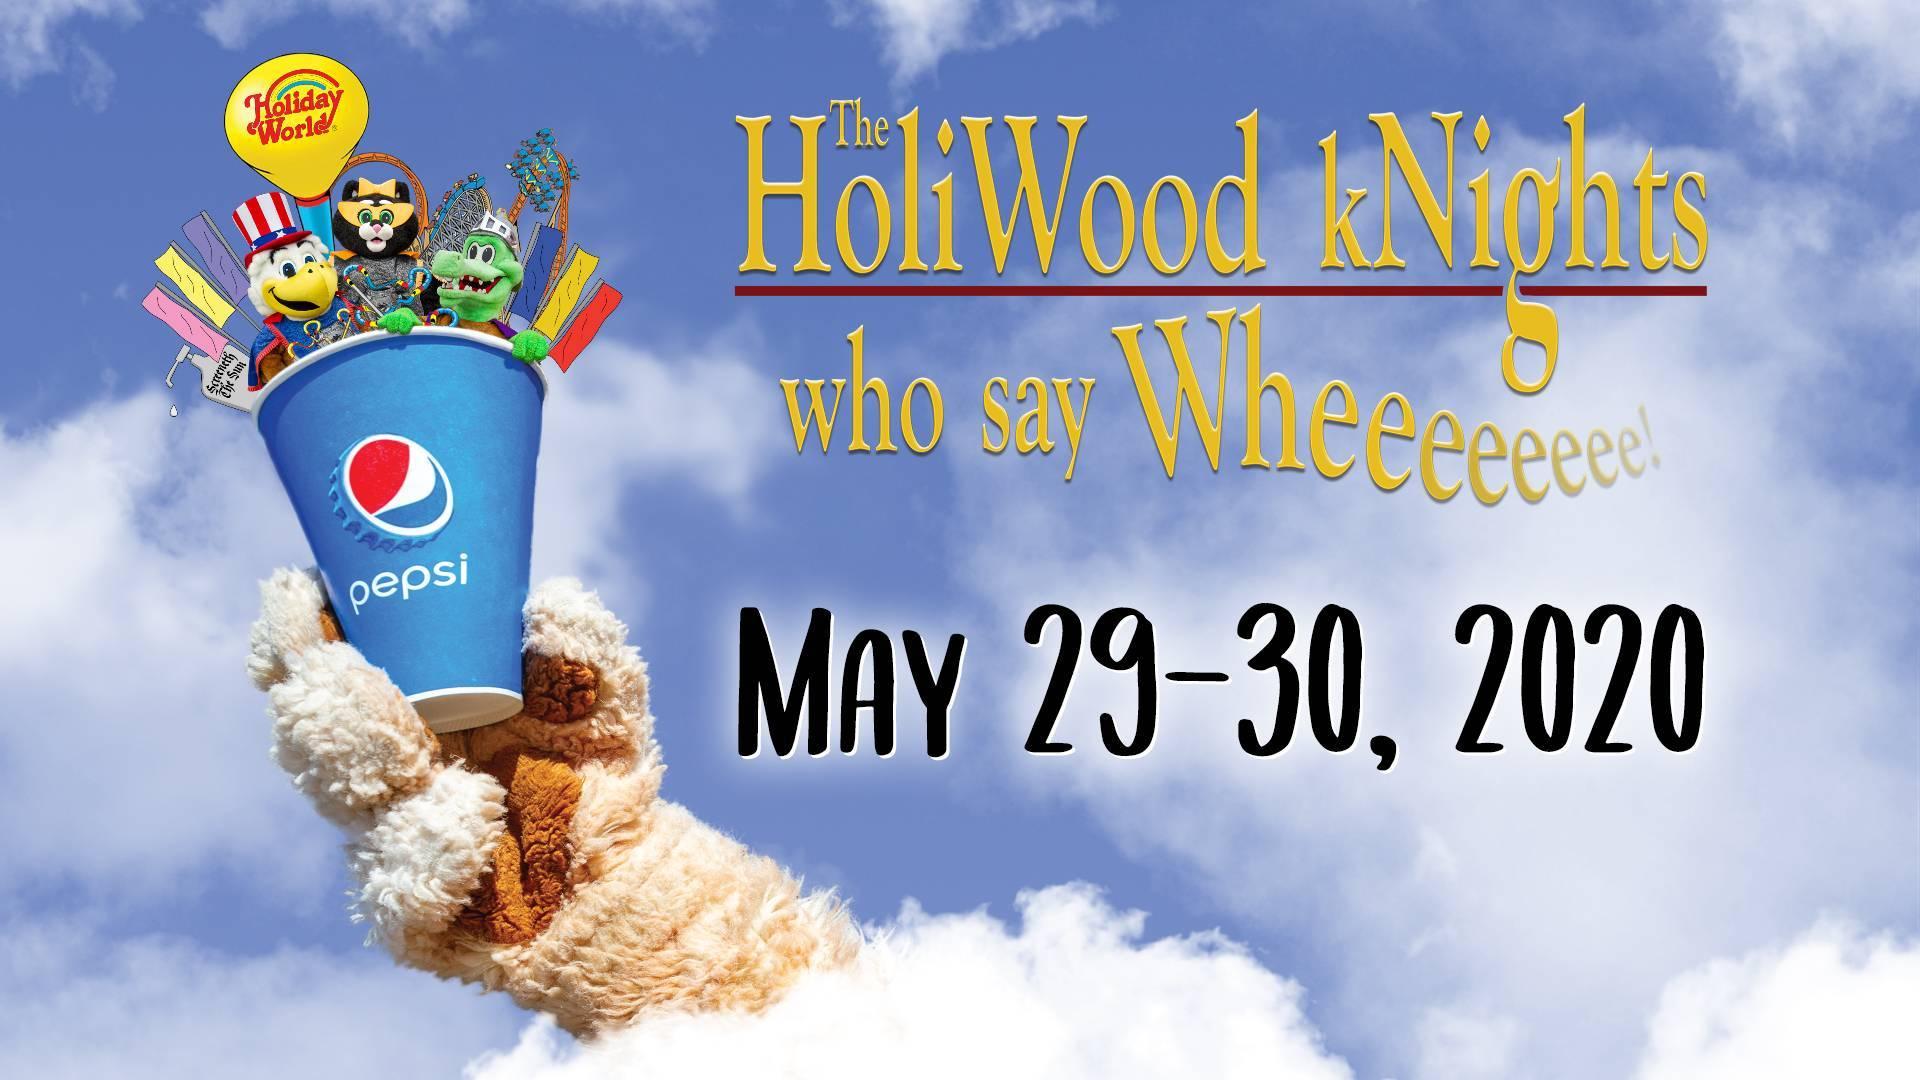 HoliWood Nights flyer